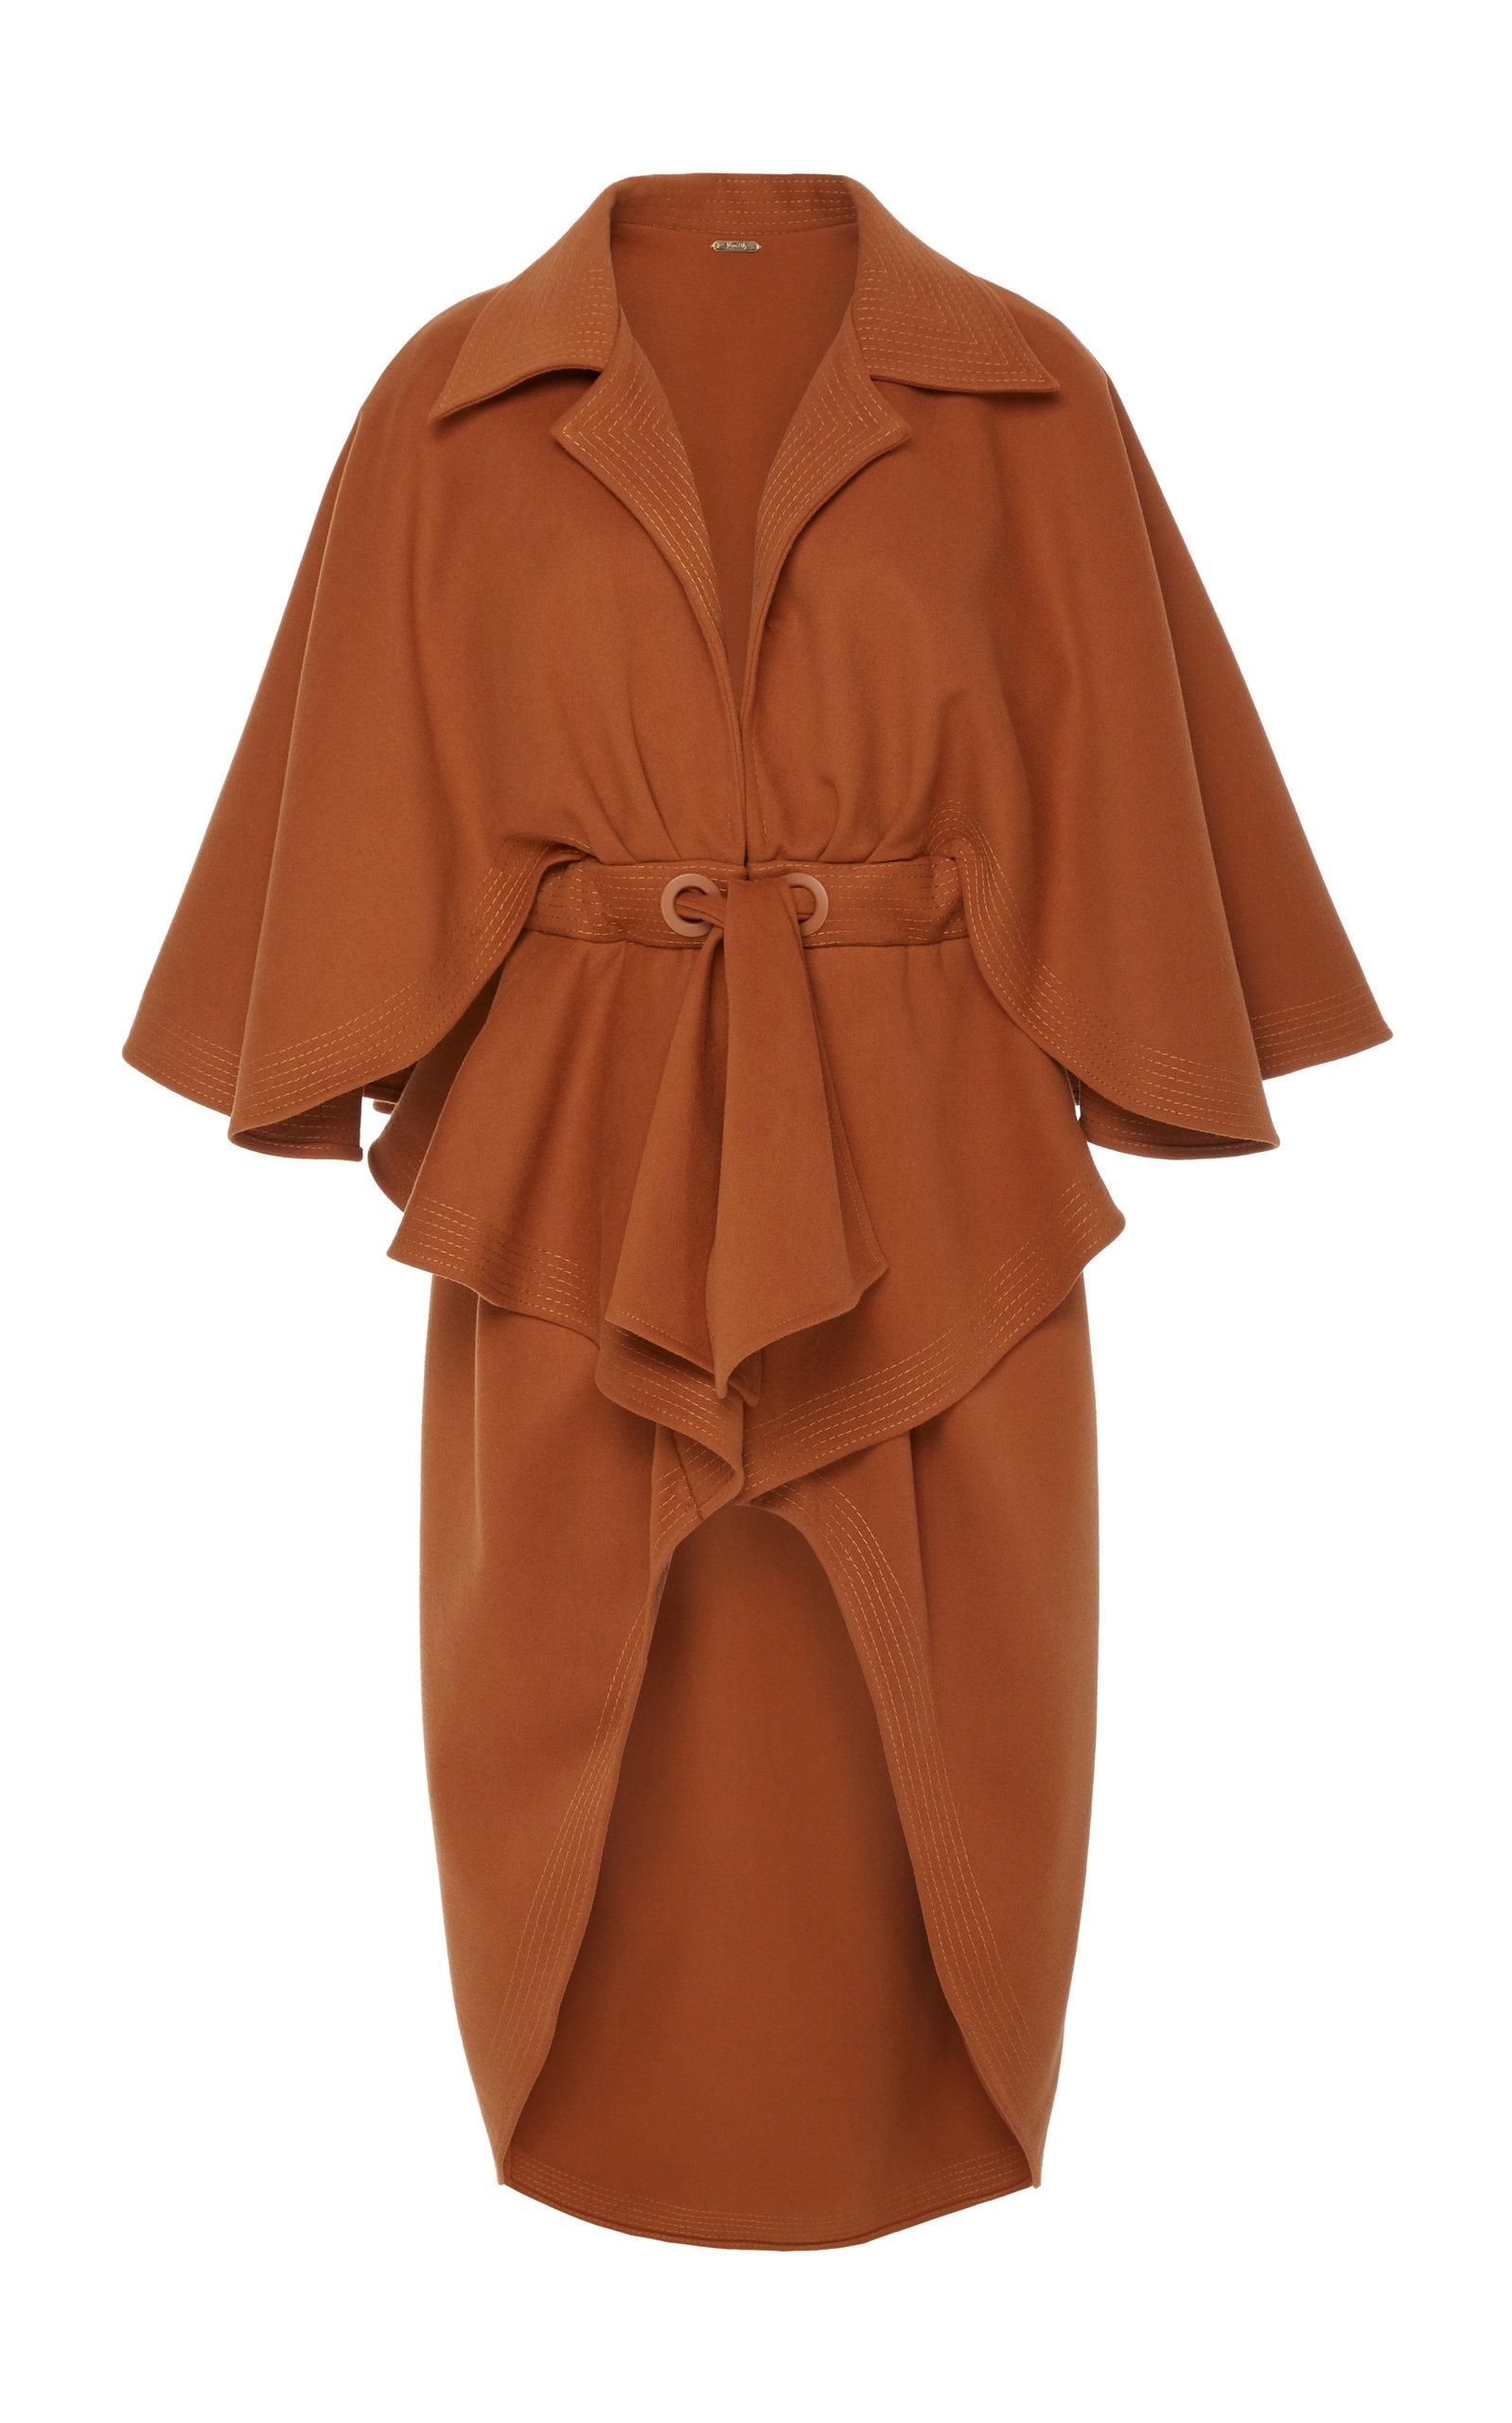 66e9d9e1 JOHANNA ORTIZ Eternal Changes Belted Cape Overcoat in Brown